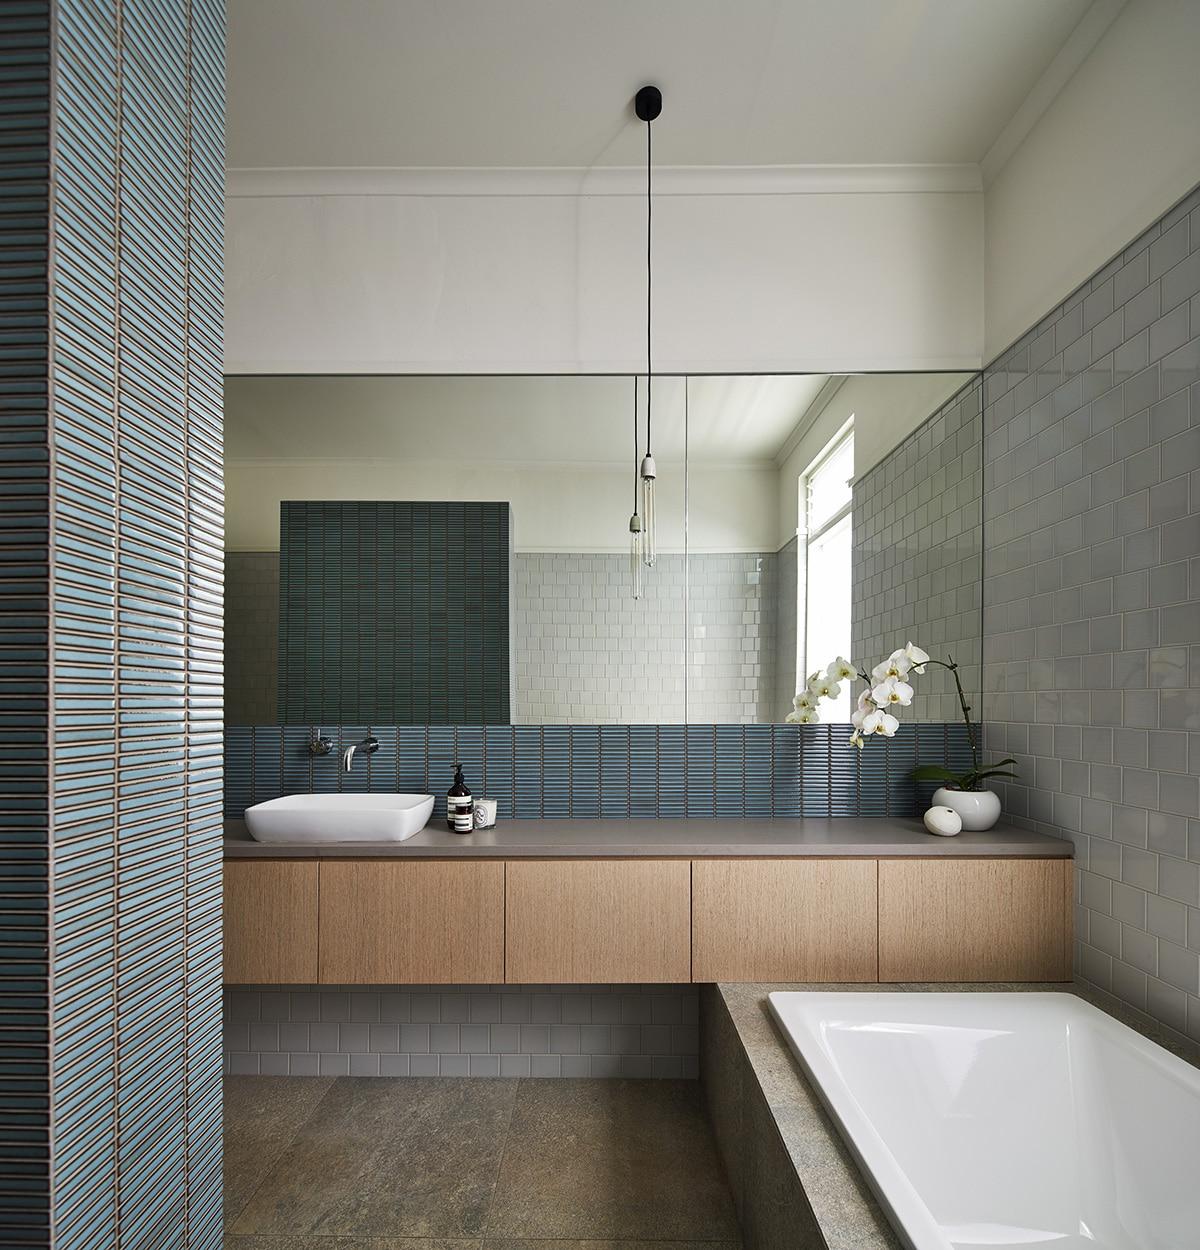 Diseno De Baño Sencillo:Architecture Spatial Solutions